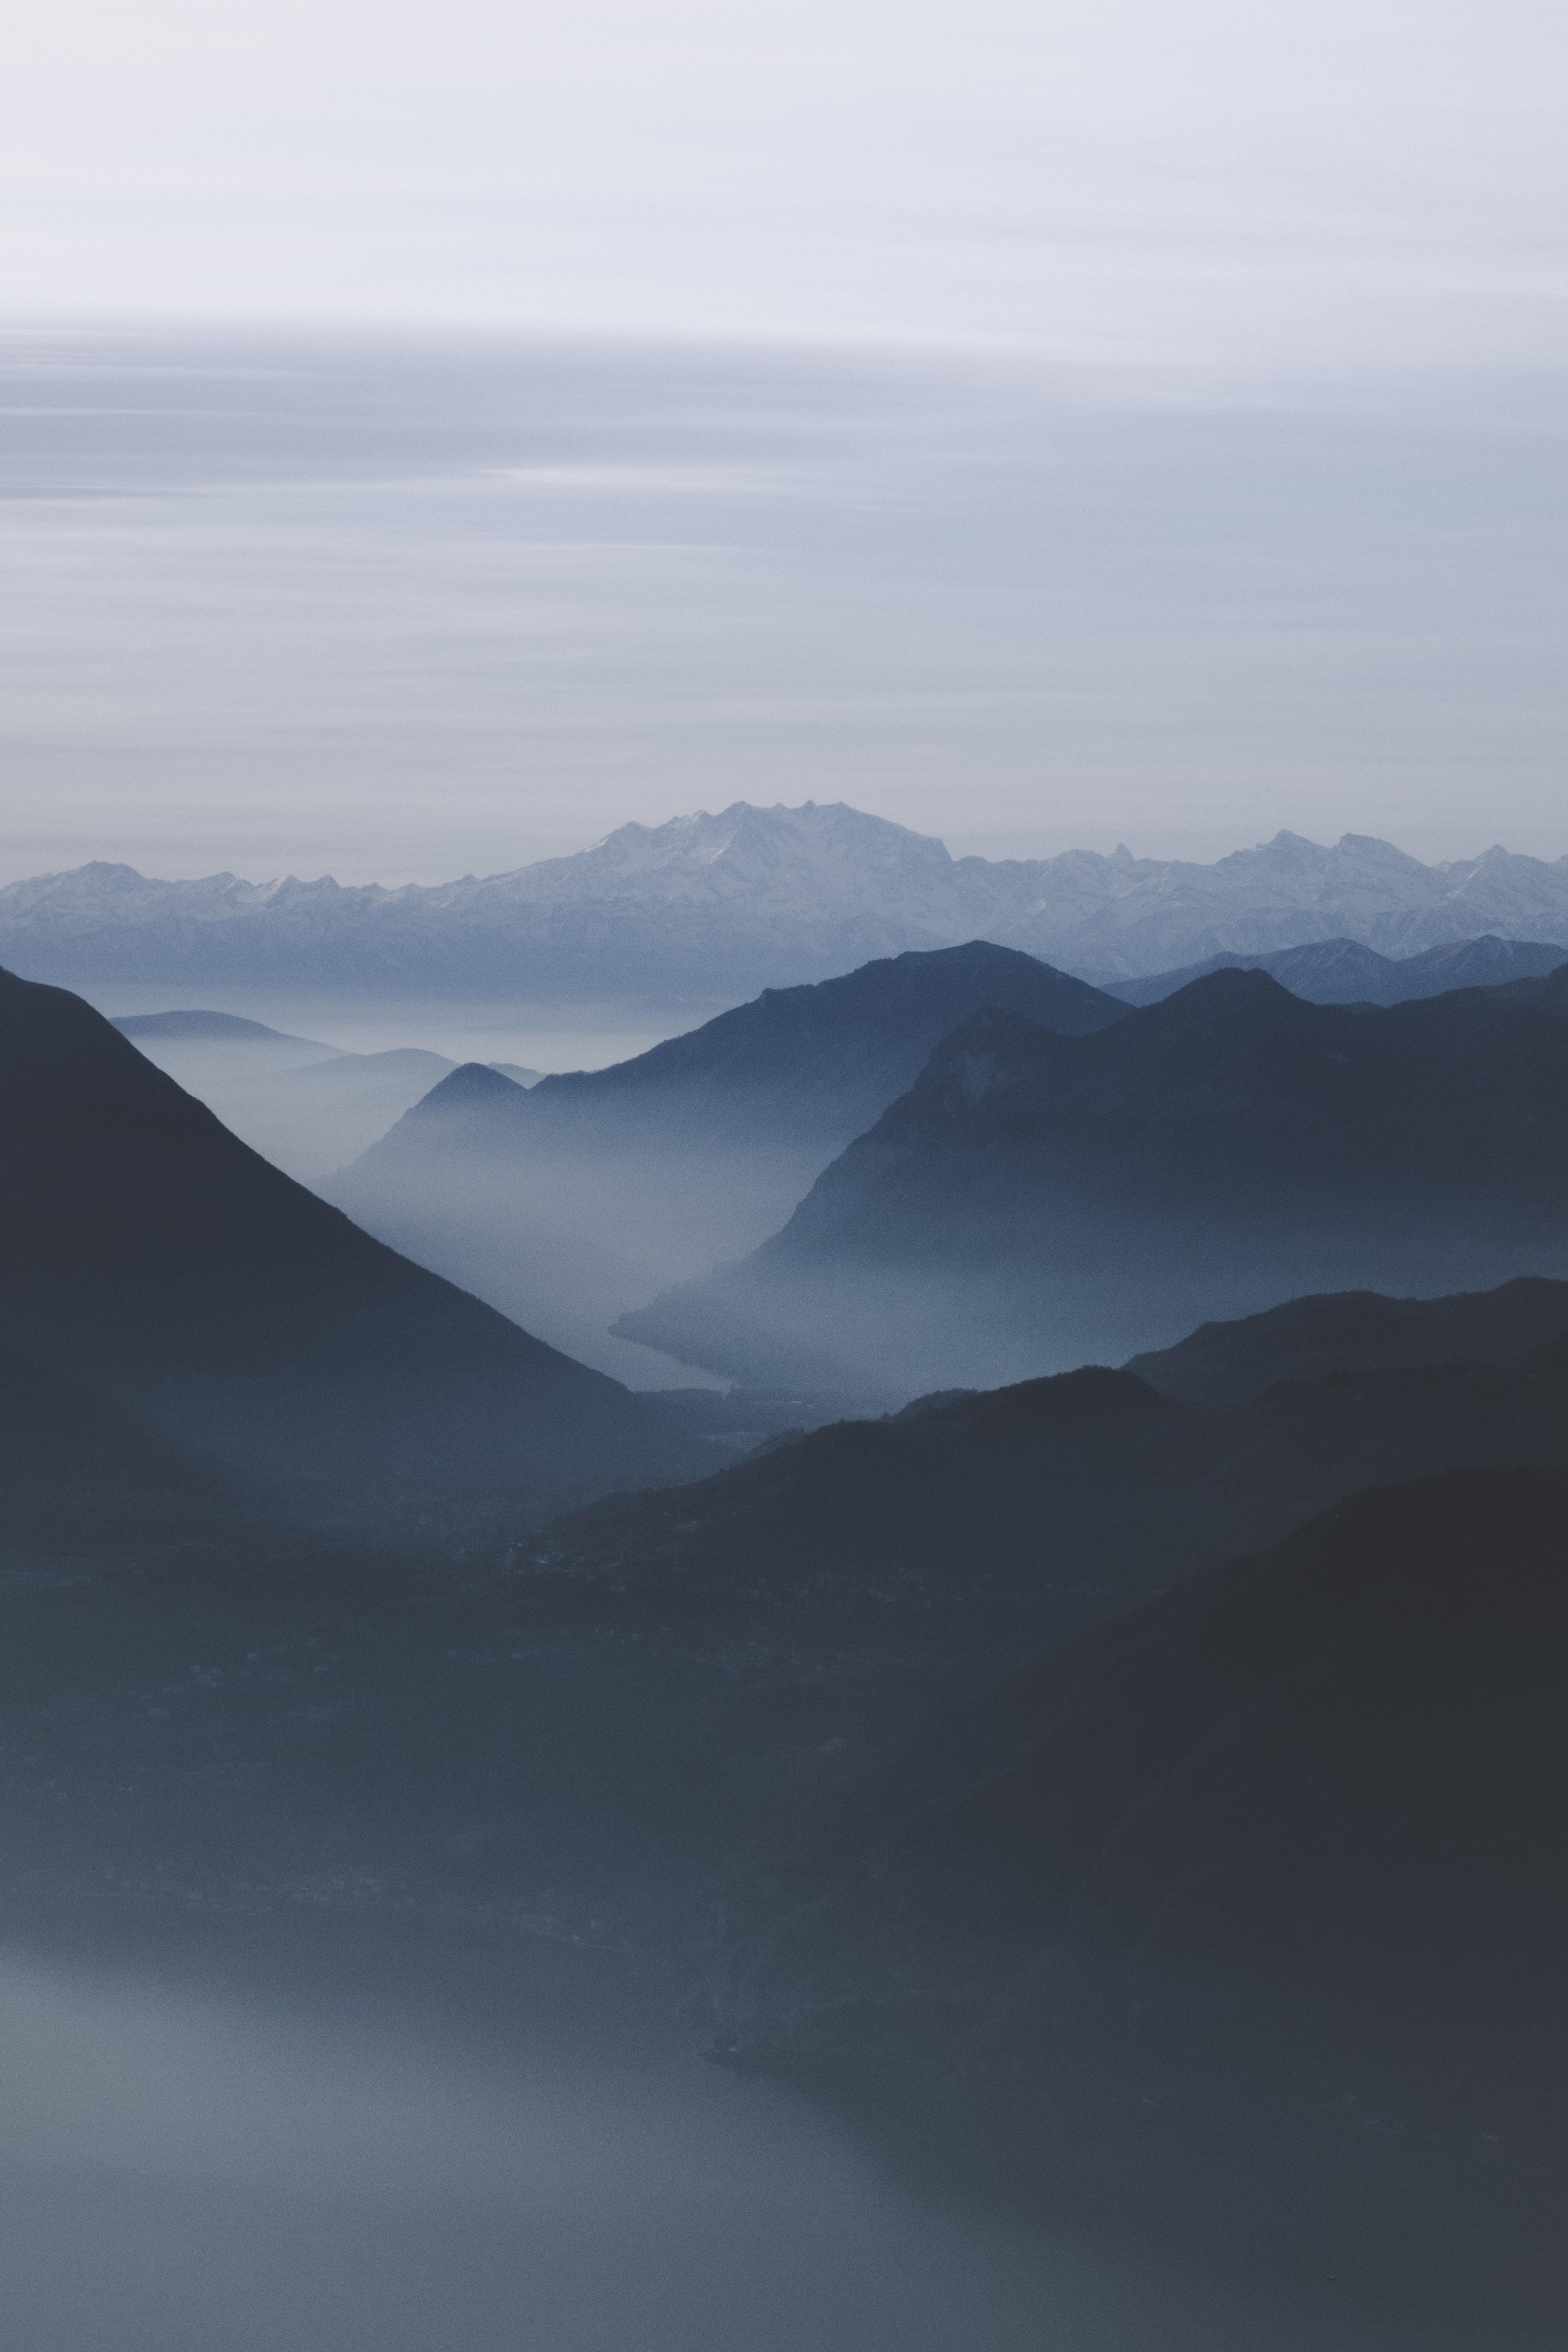 mist mountain range under white sky